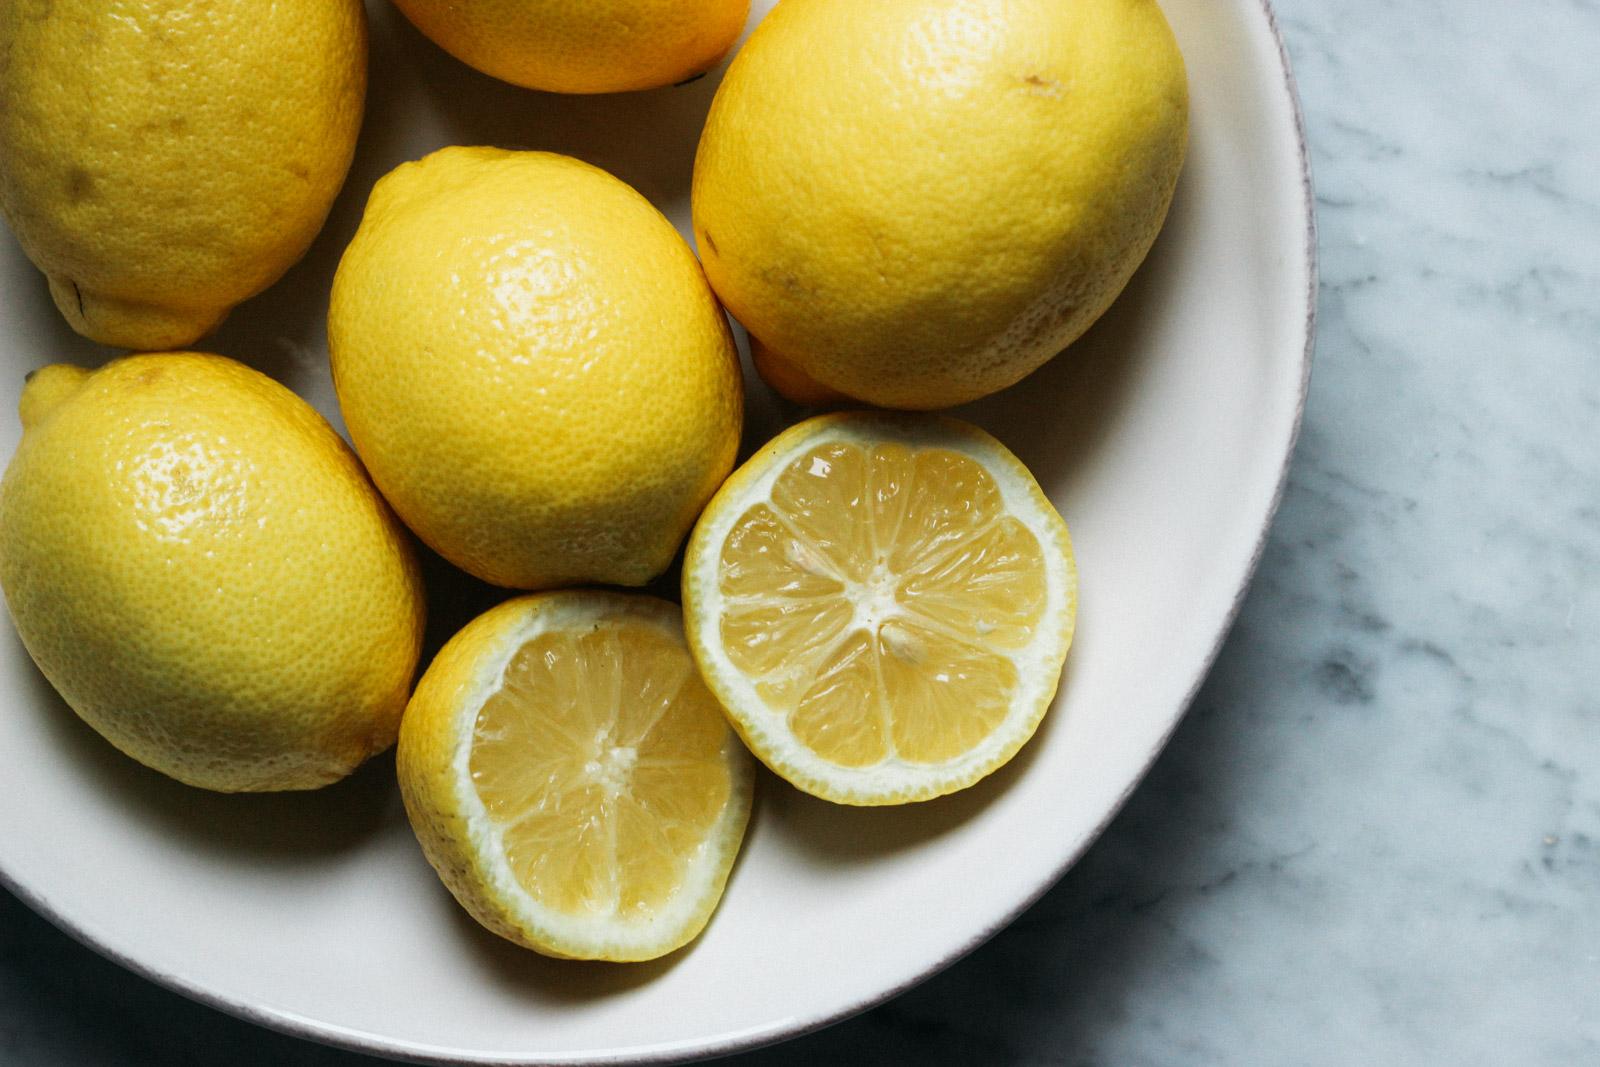 LemonWater-10.jpg